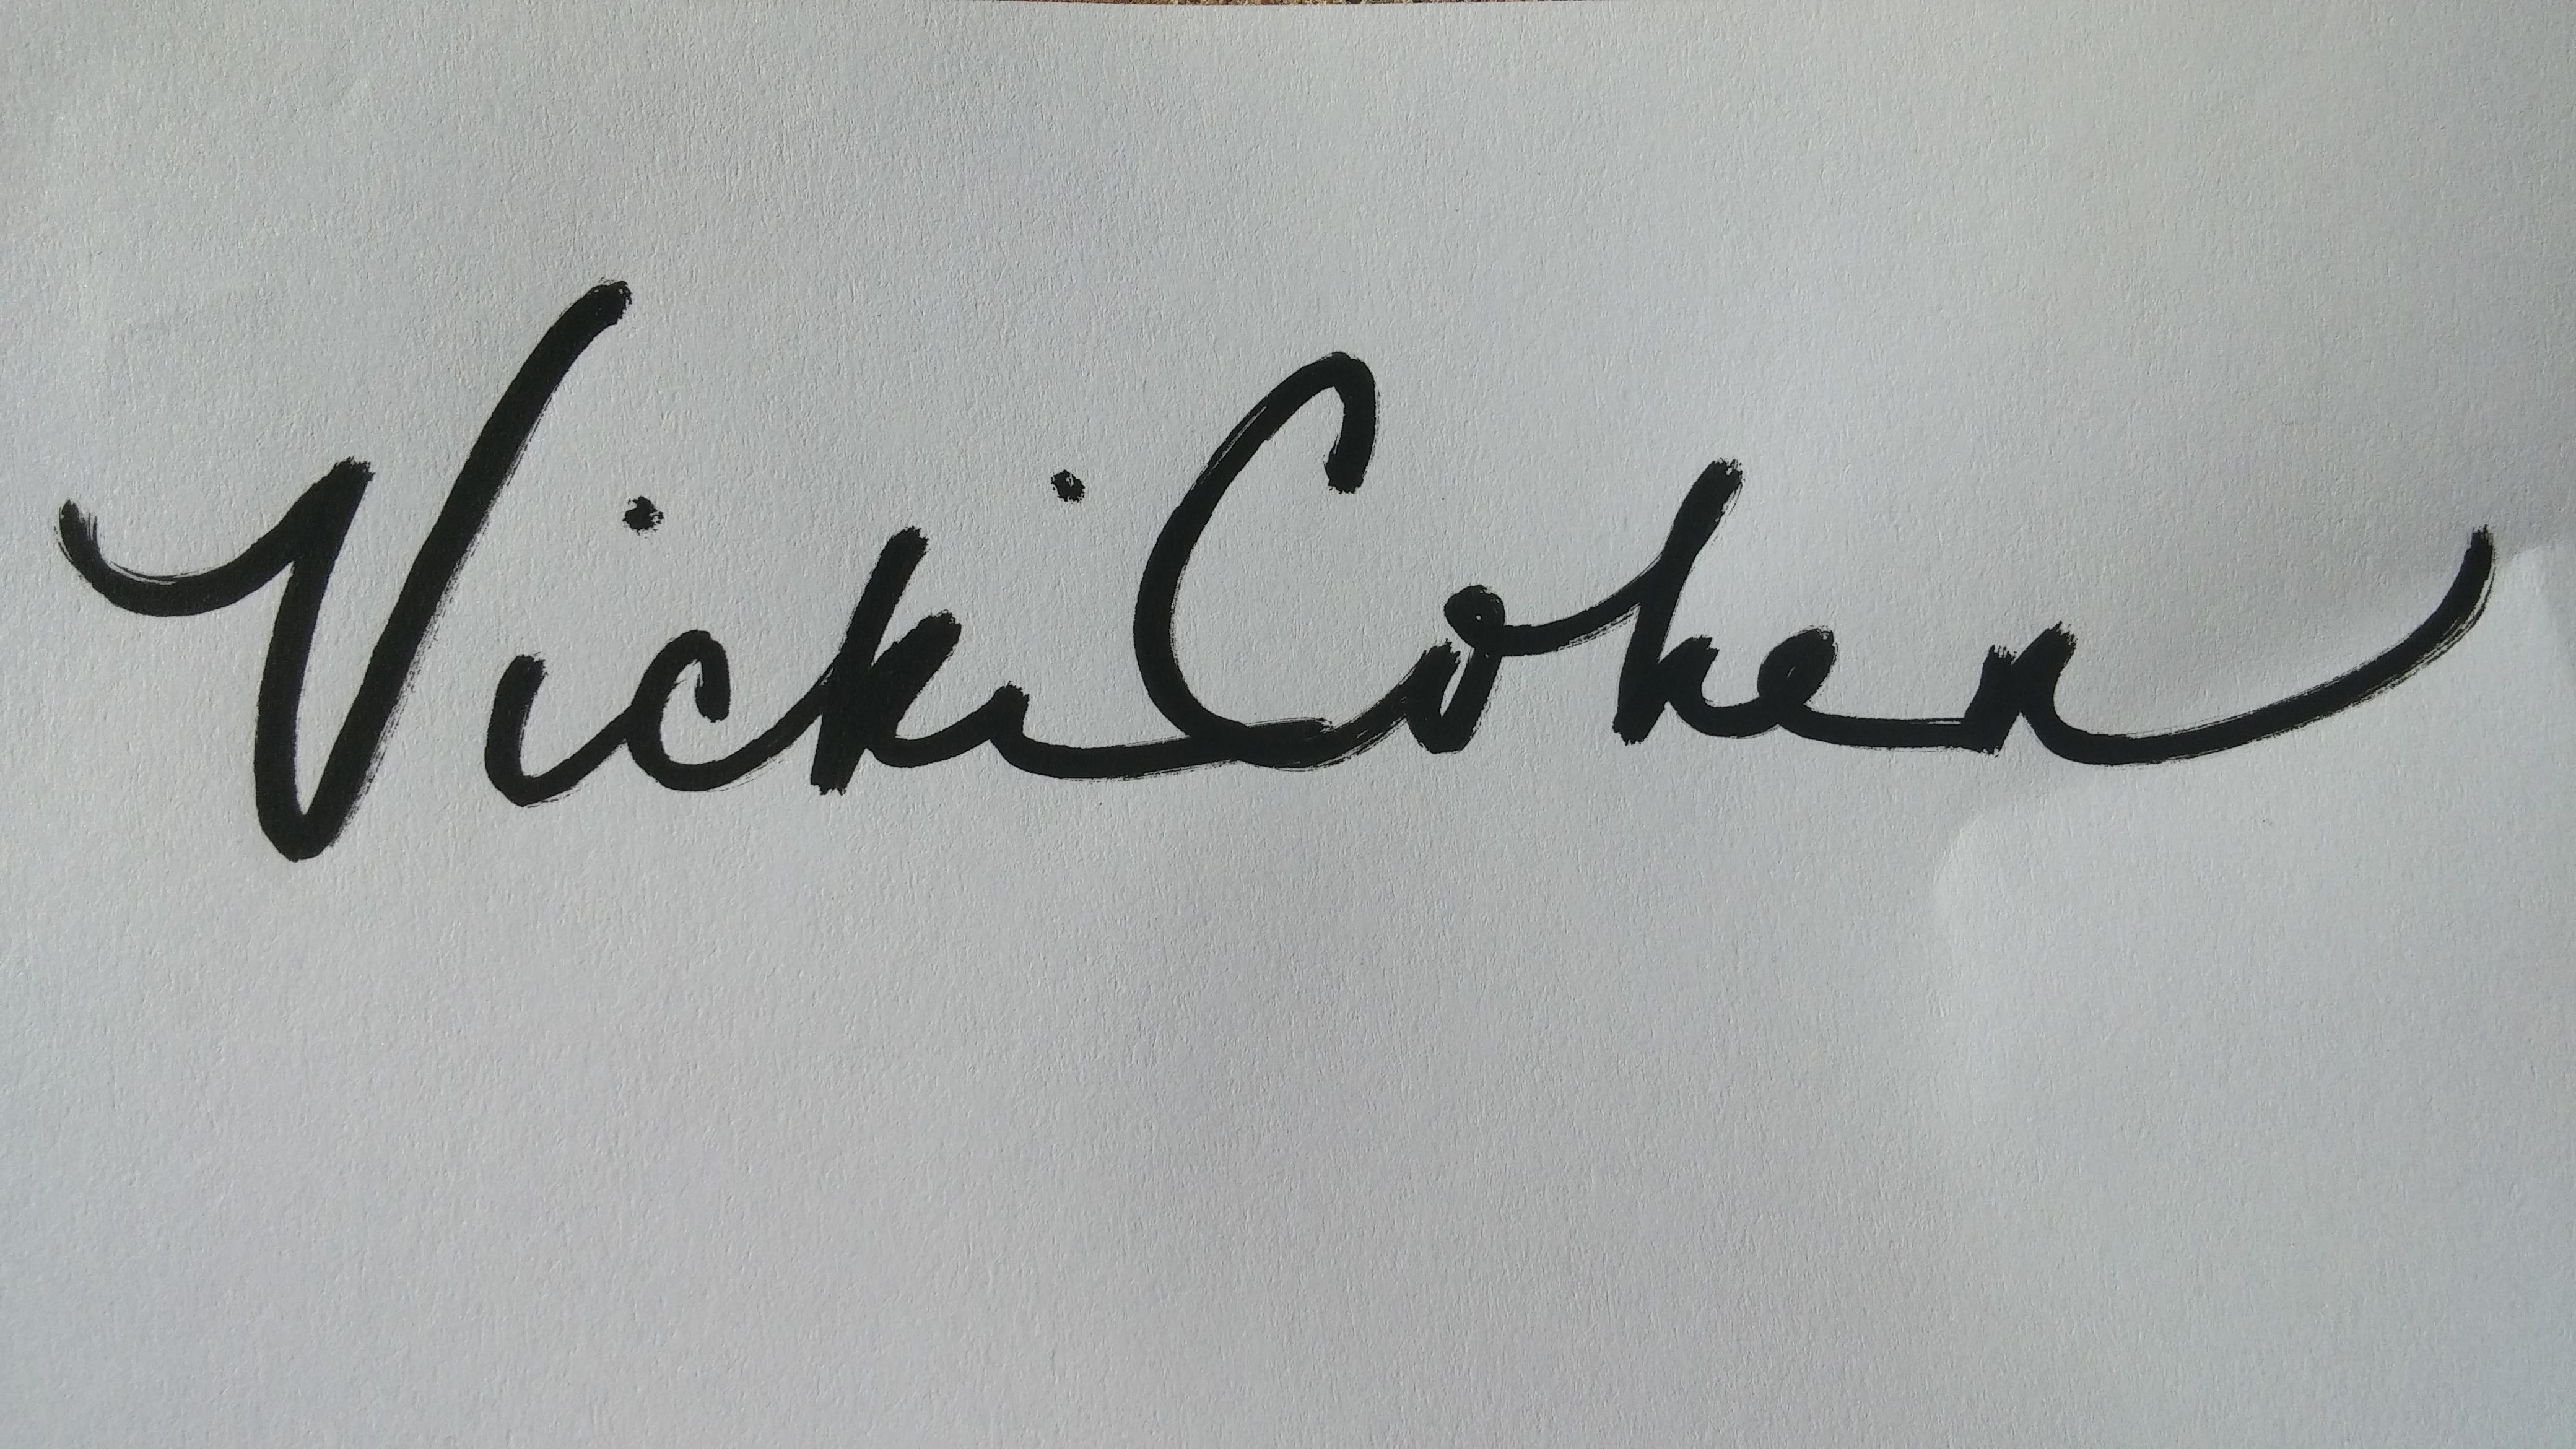 Vicki Cohen's Signature